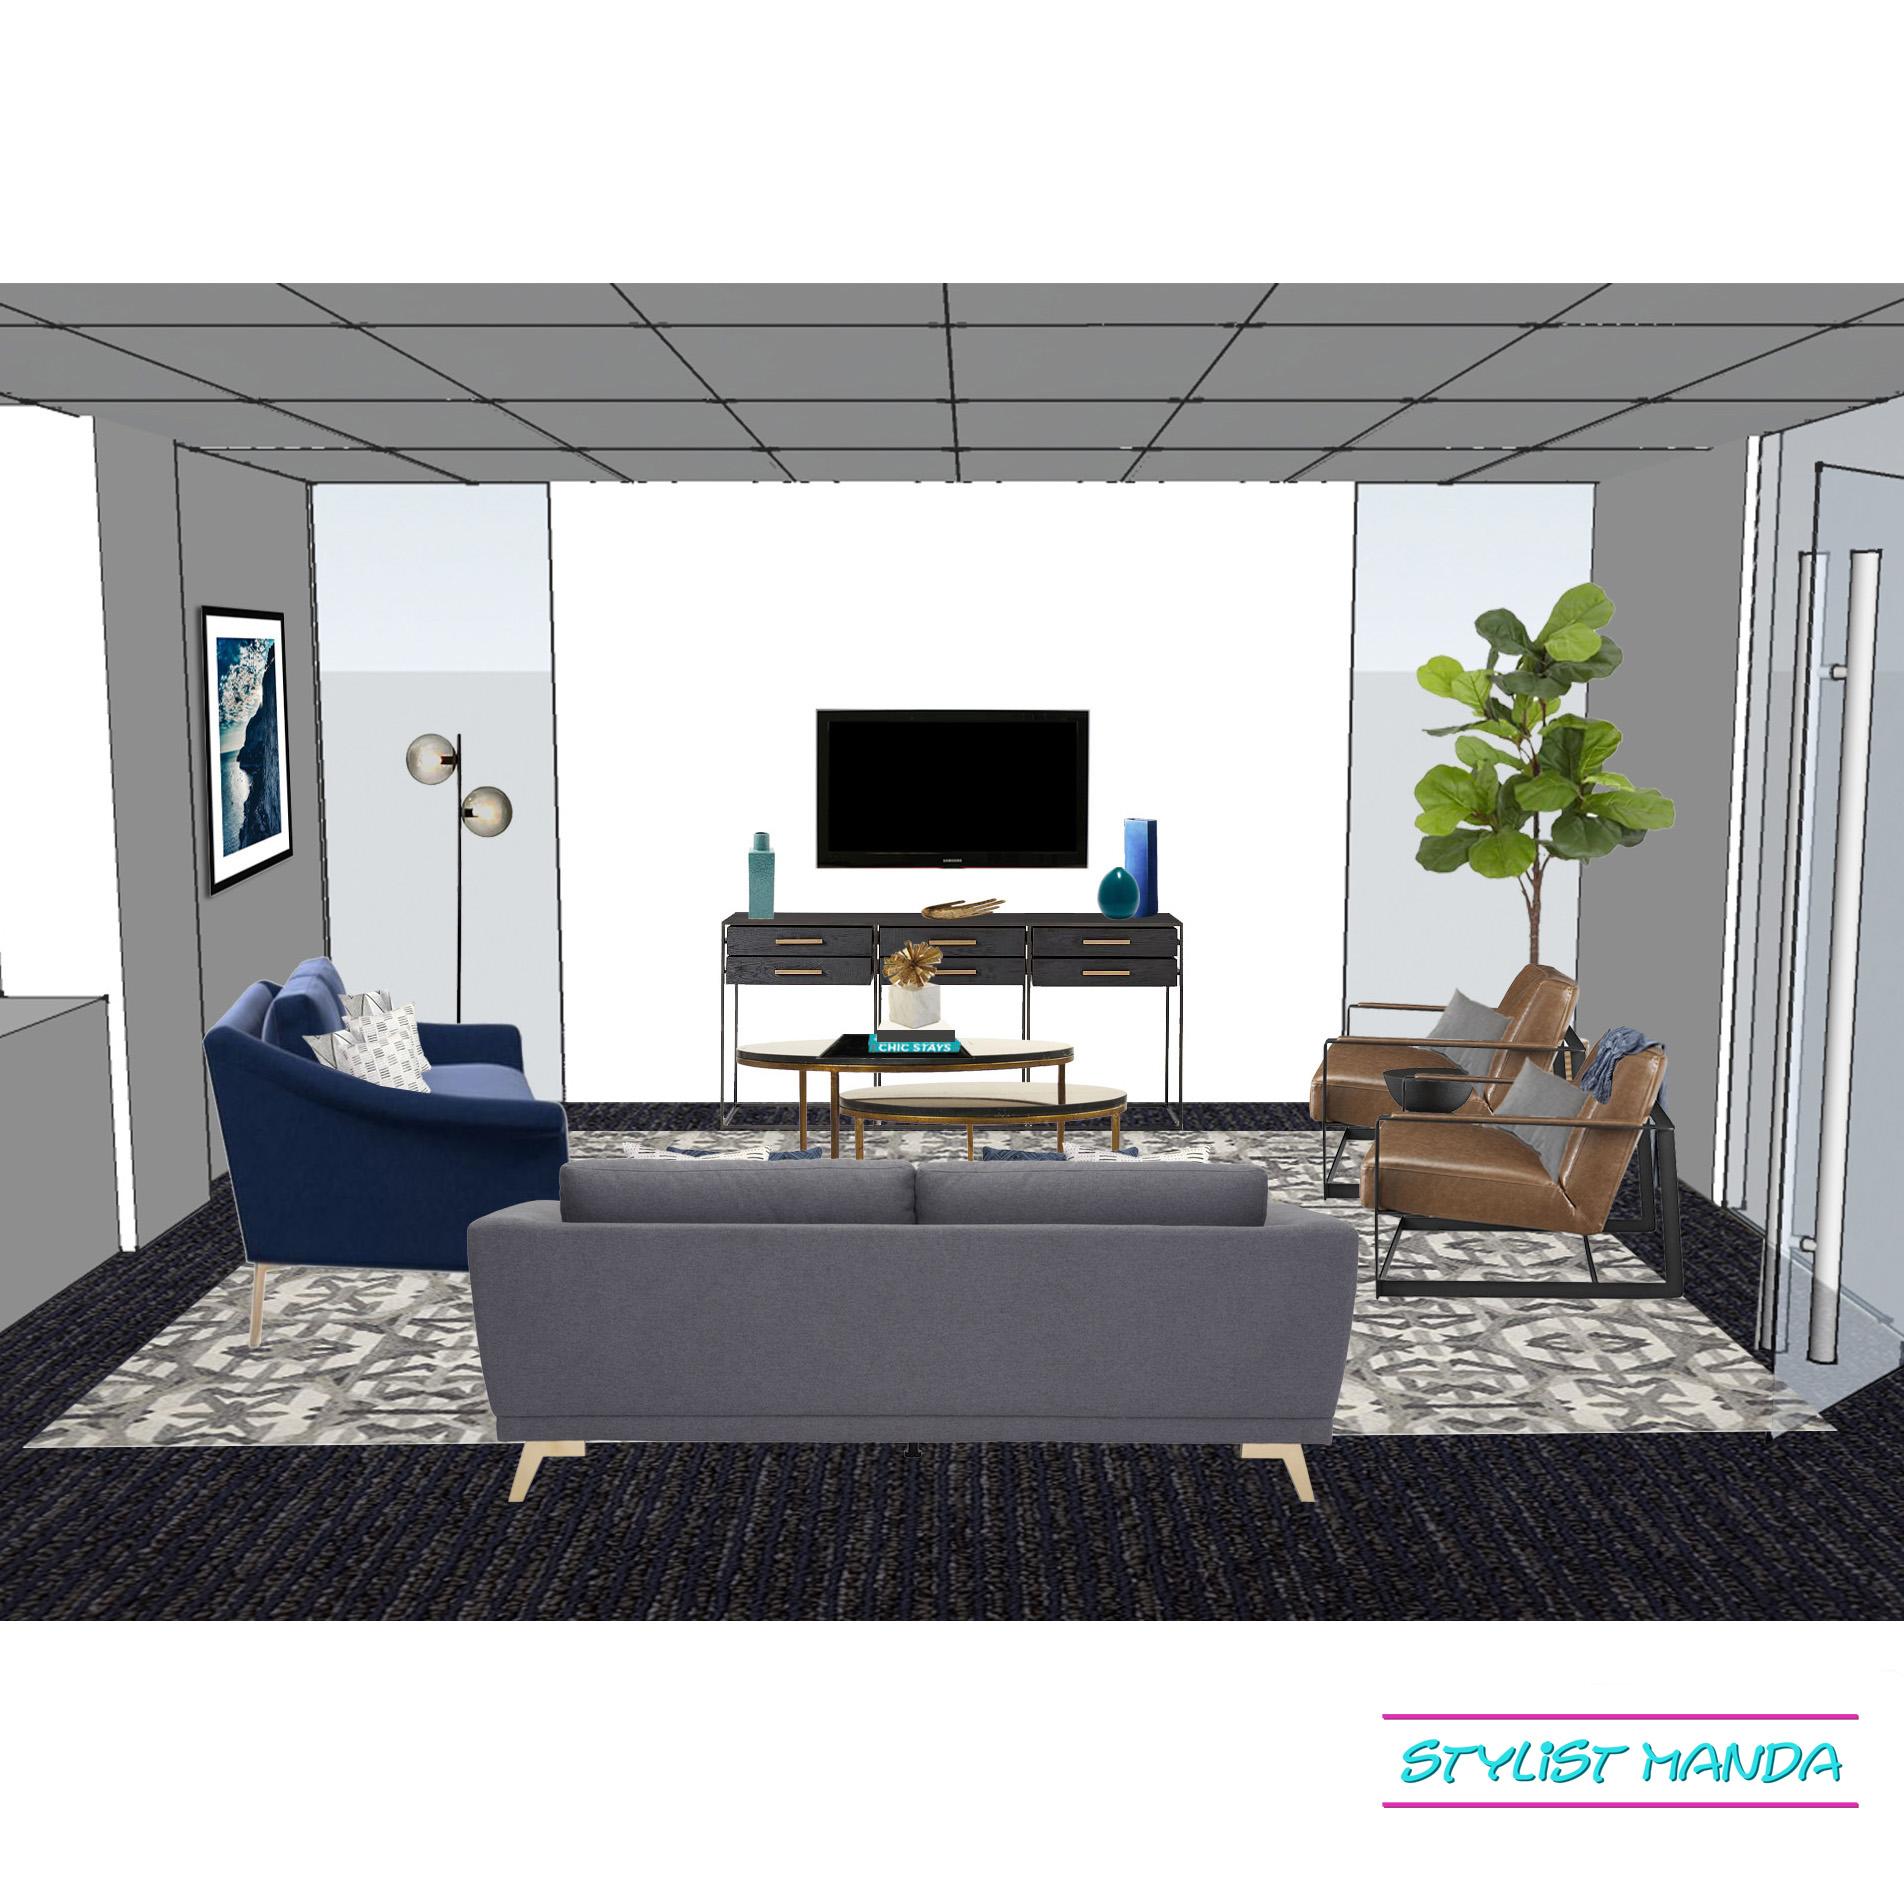 Room View Option 1